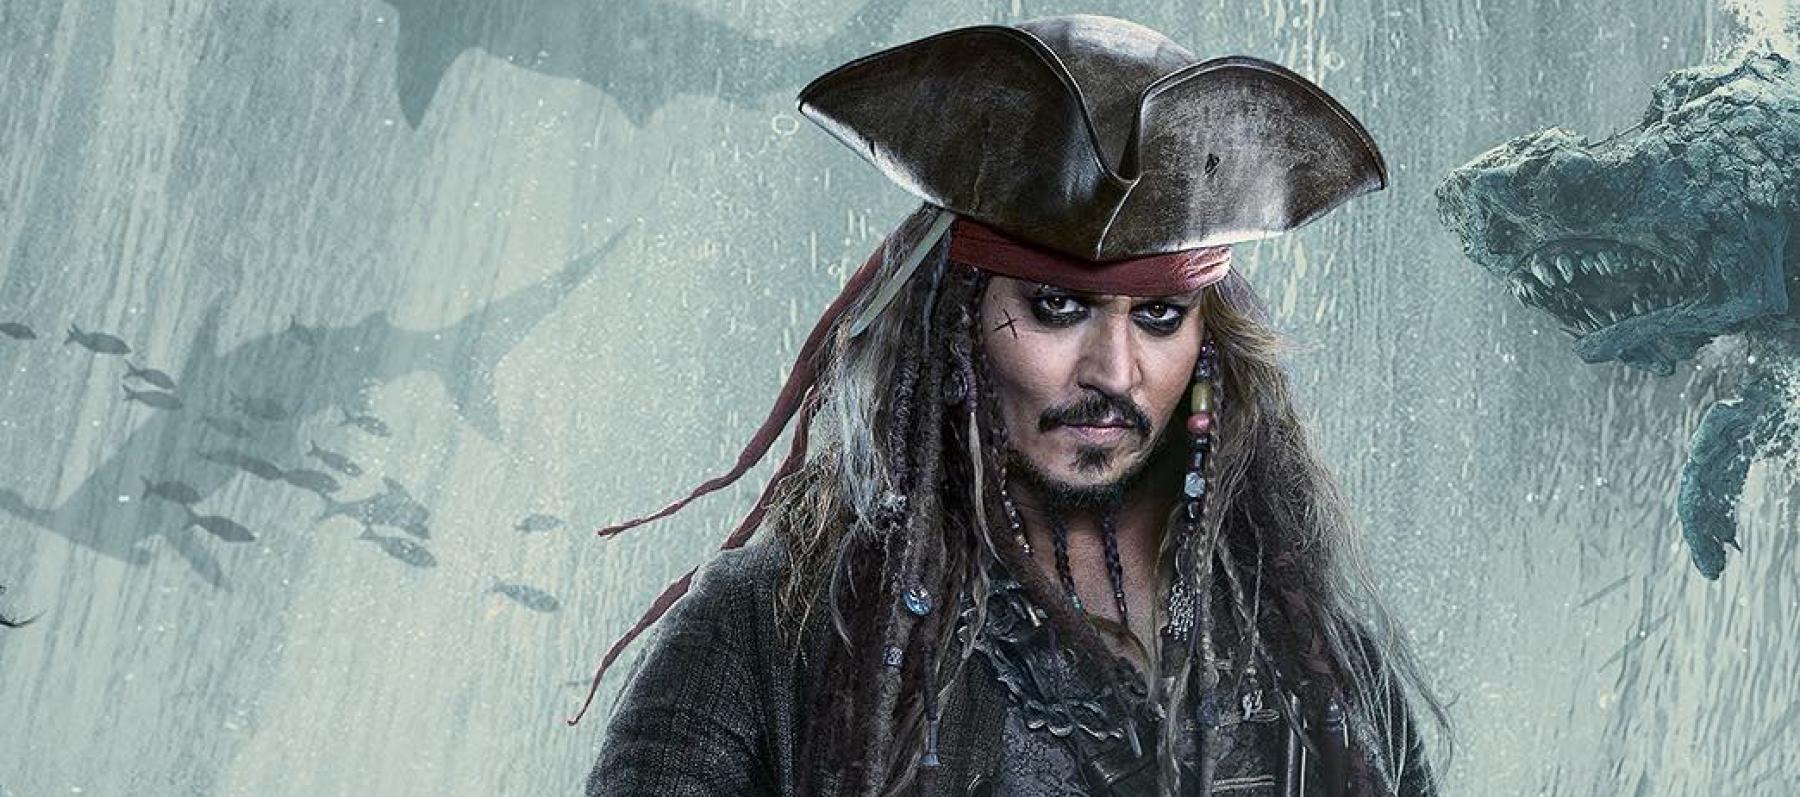 ديزني تمنع جوني ديب من الظهور في Pirates of The Caribbean